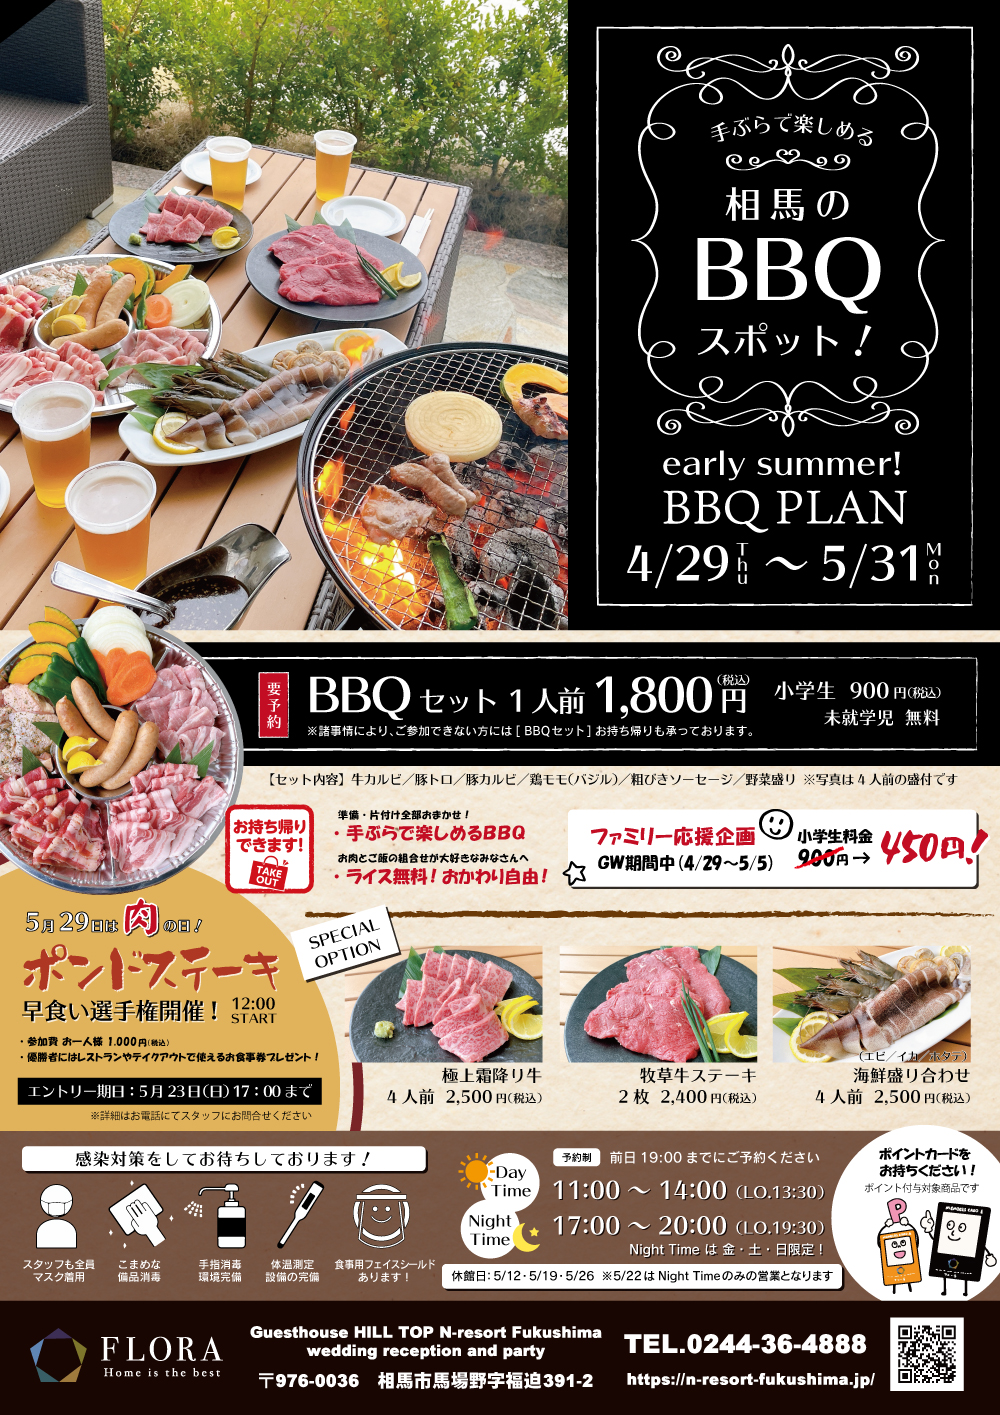 【GW~5月限定!】BBQイベント開催!【福島】